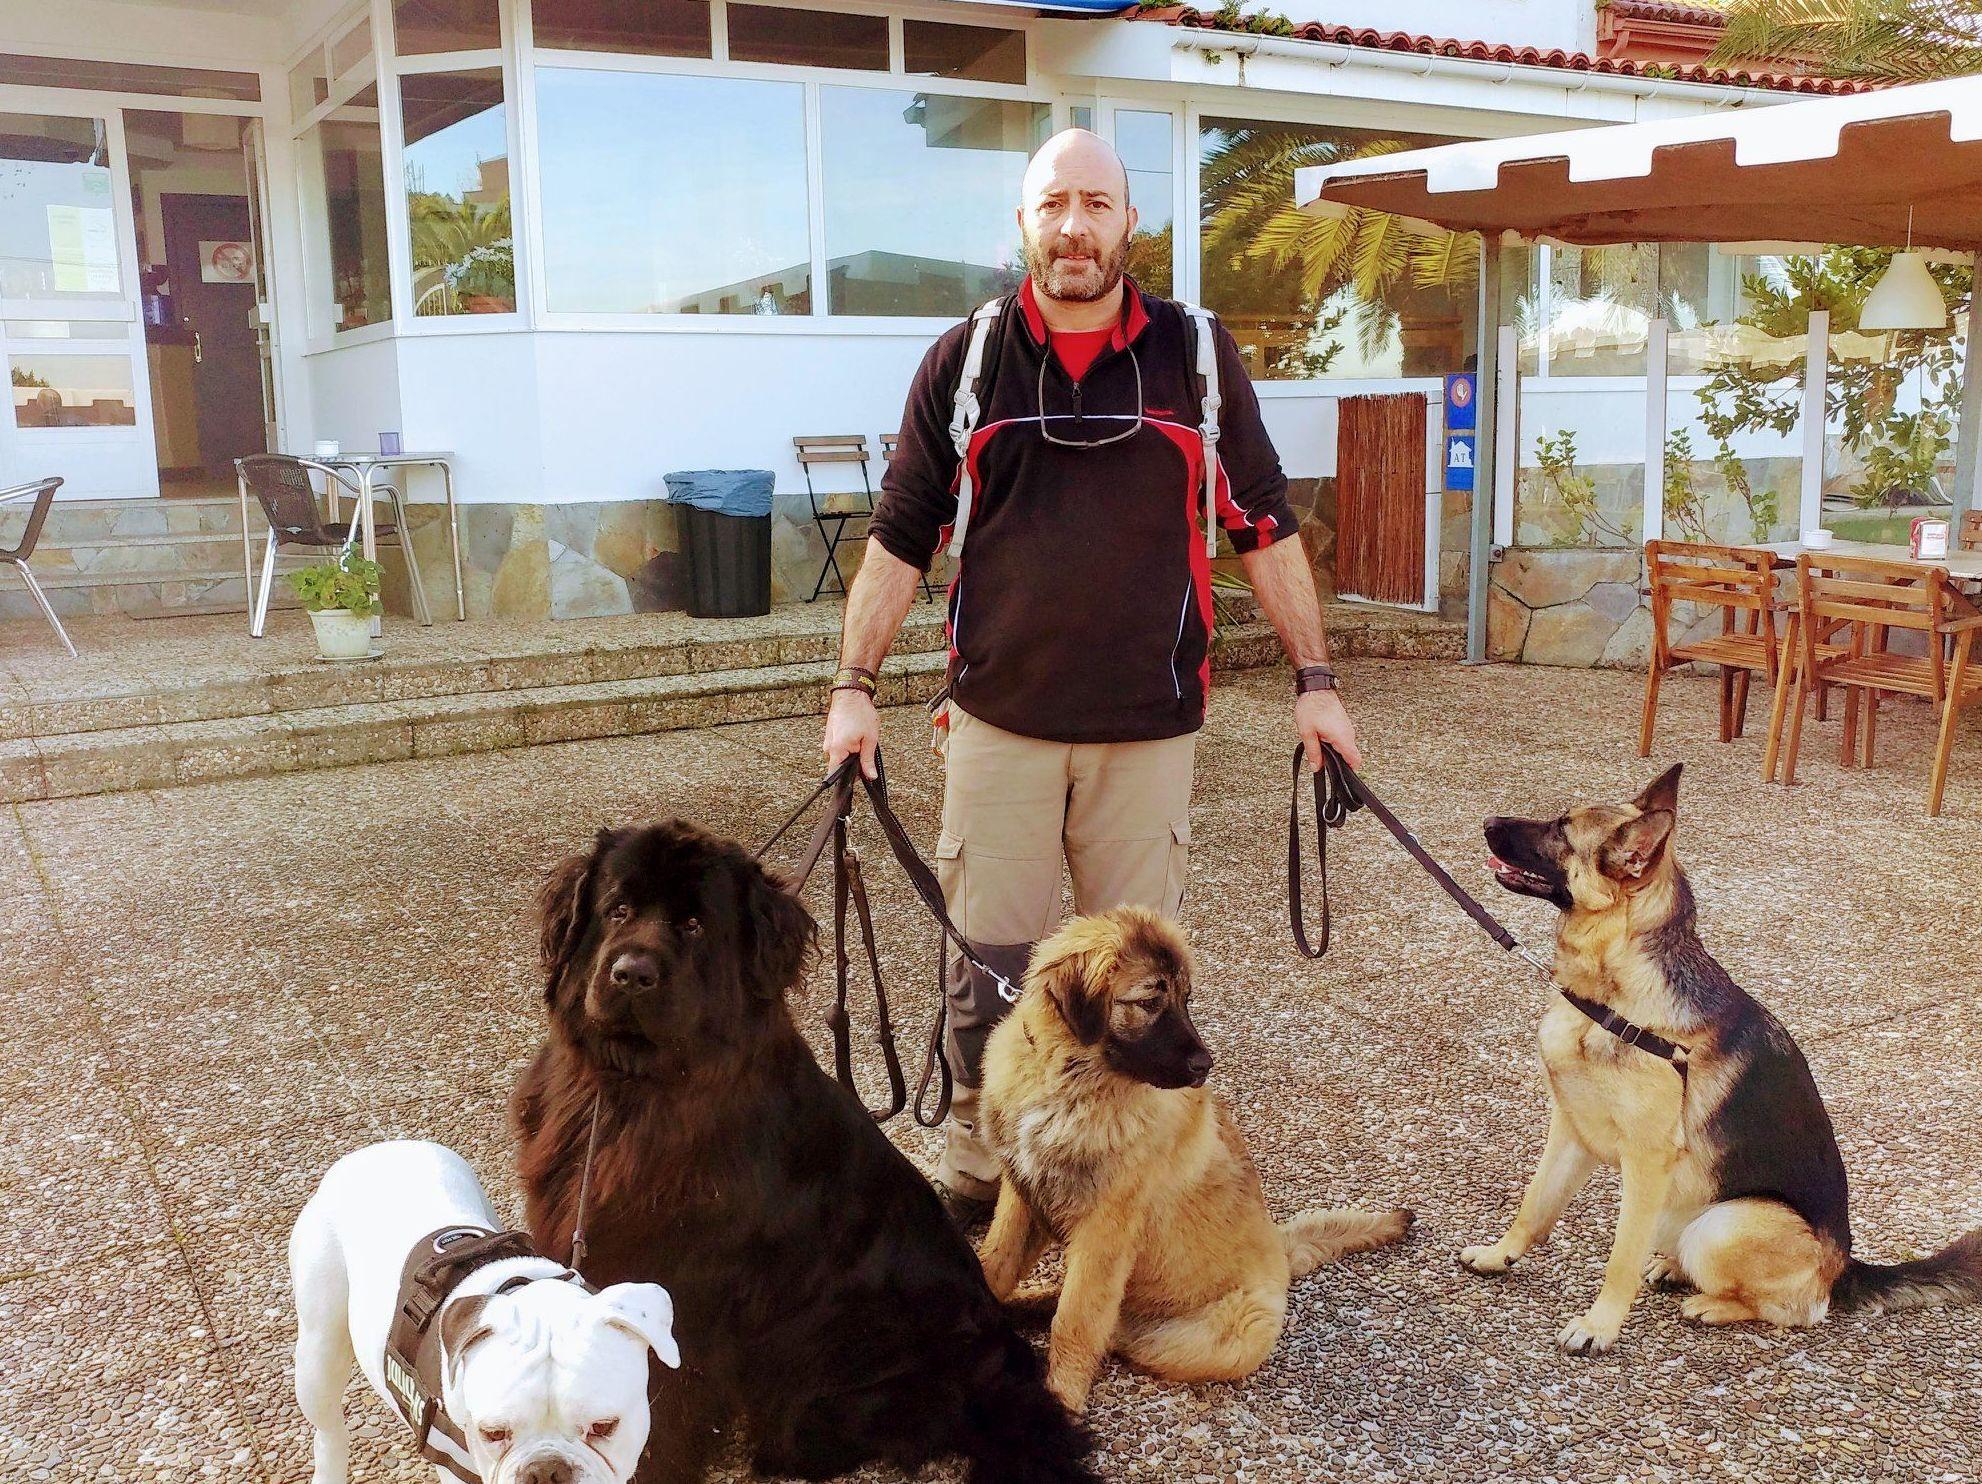 Paseos de mascotas.: Servicios de CaminoCan